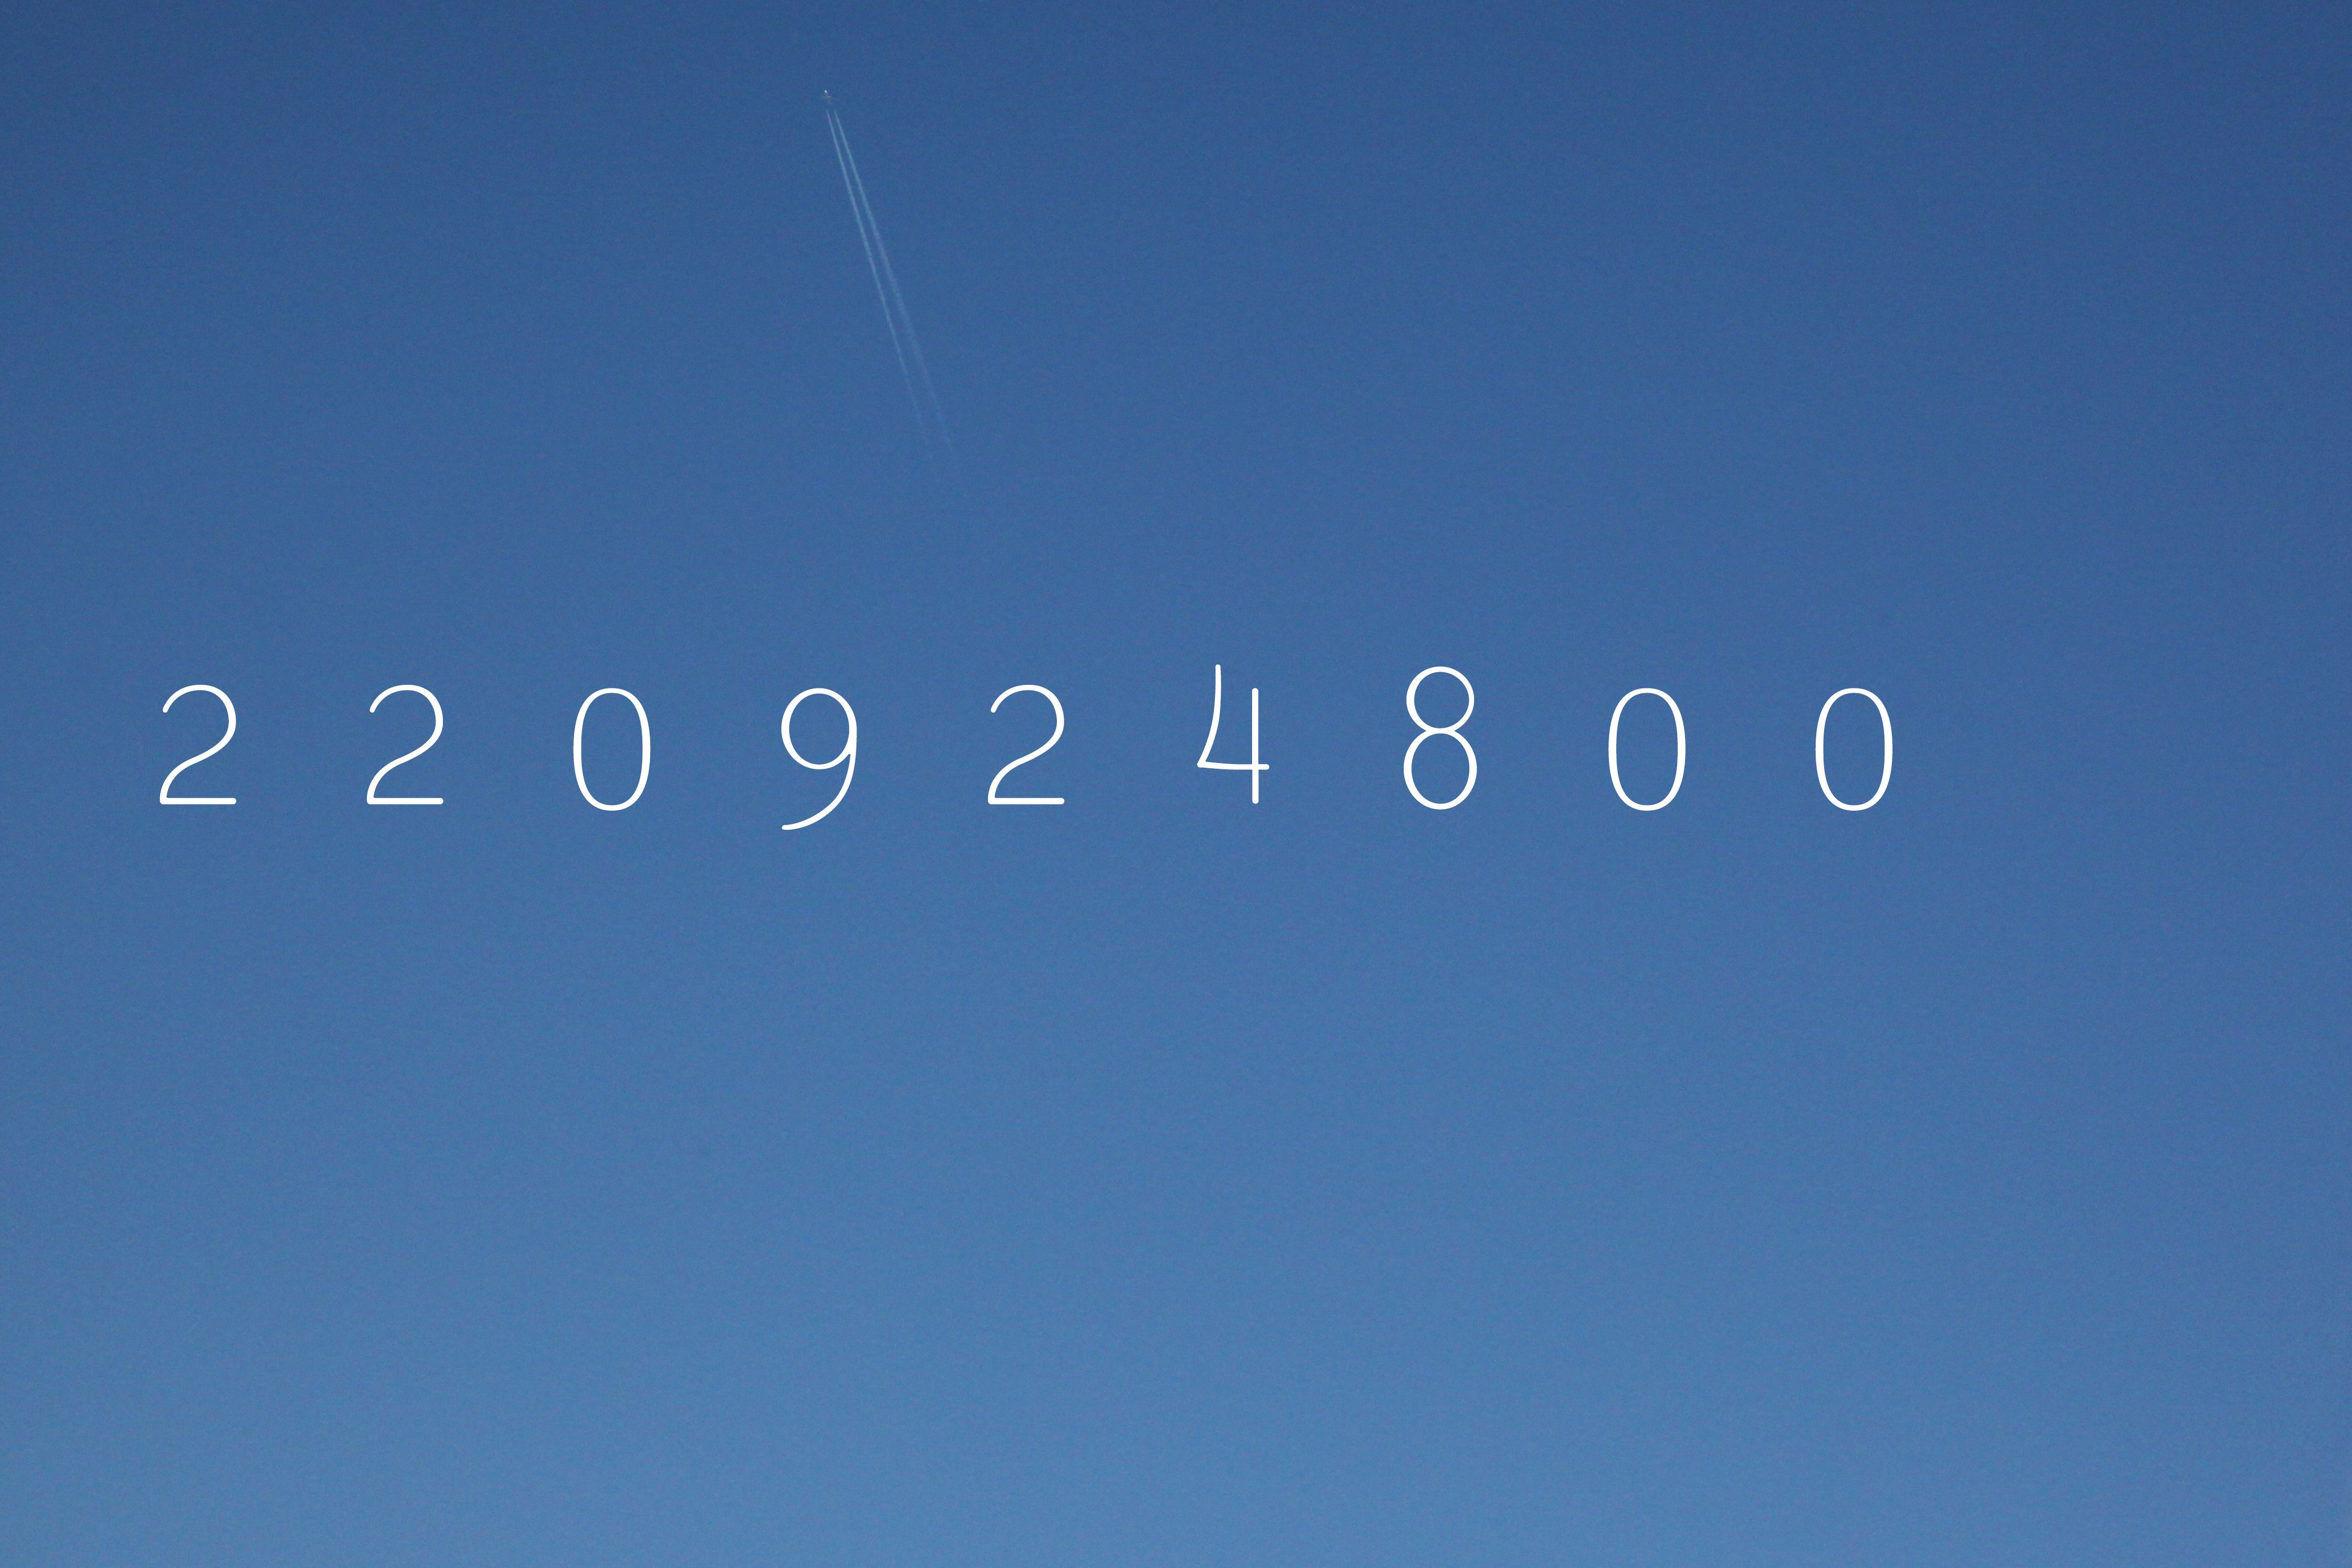 Leap Second, 31 December 1976 - 23:59:60